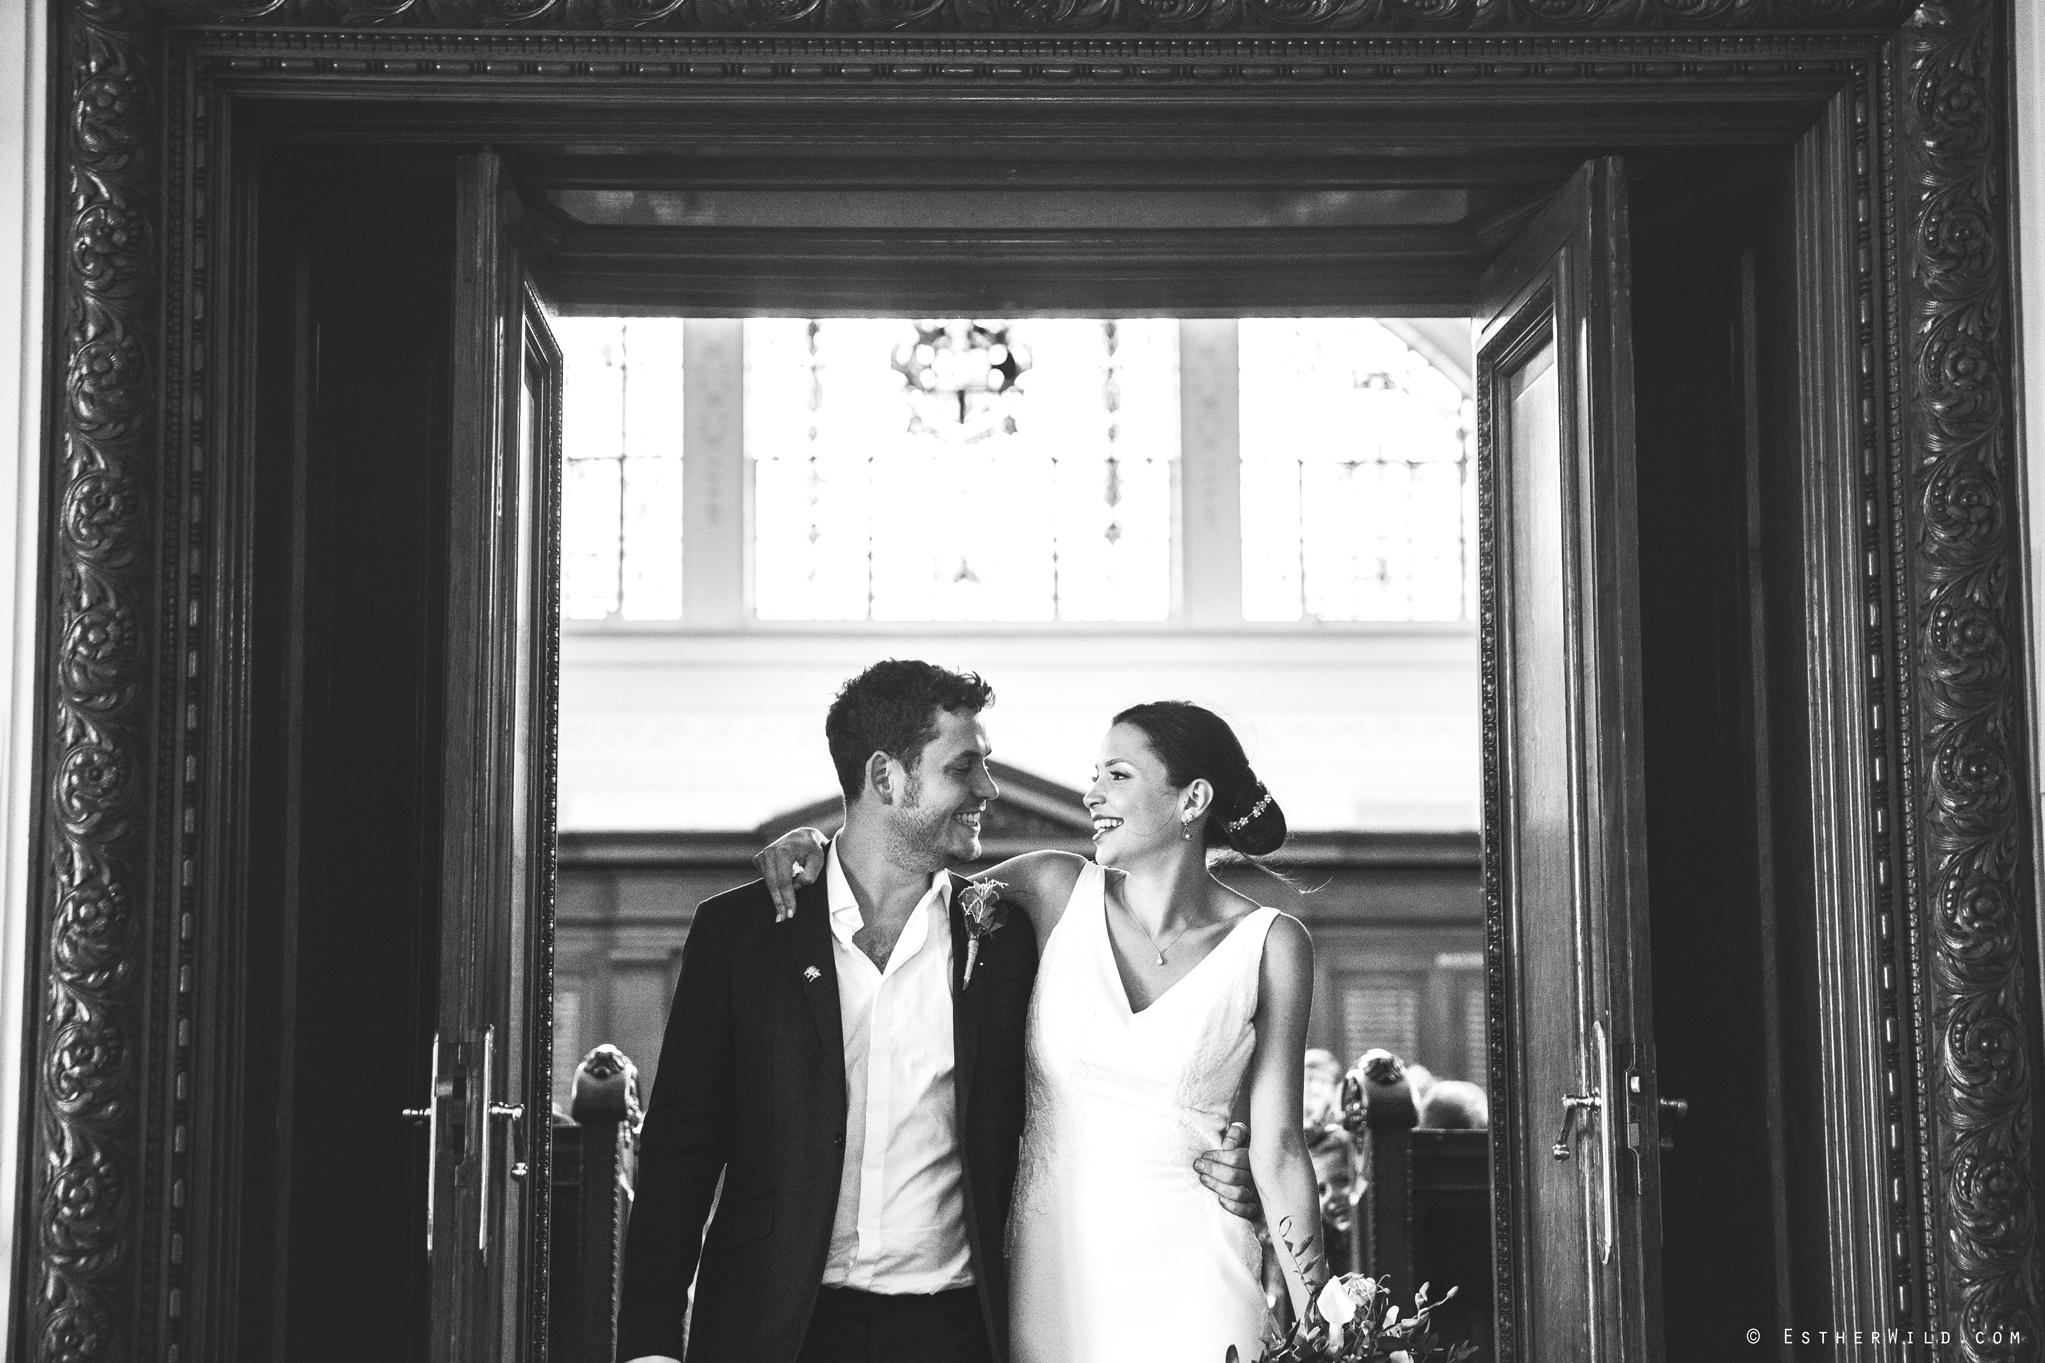 Islington_Town_Hall_Wedding_London_Photographer_Esther_Wild_IMG_5116-1.jpg